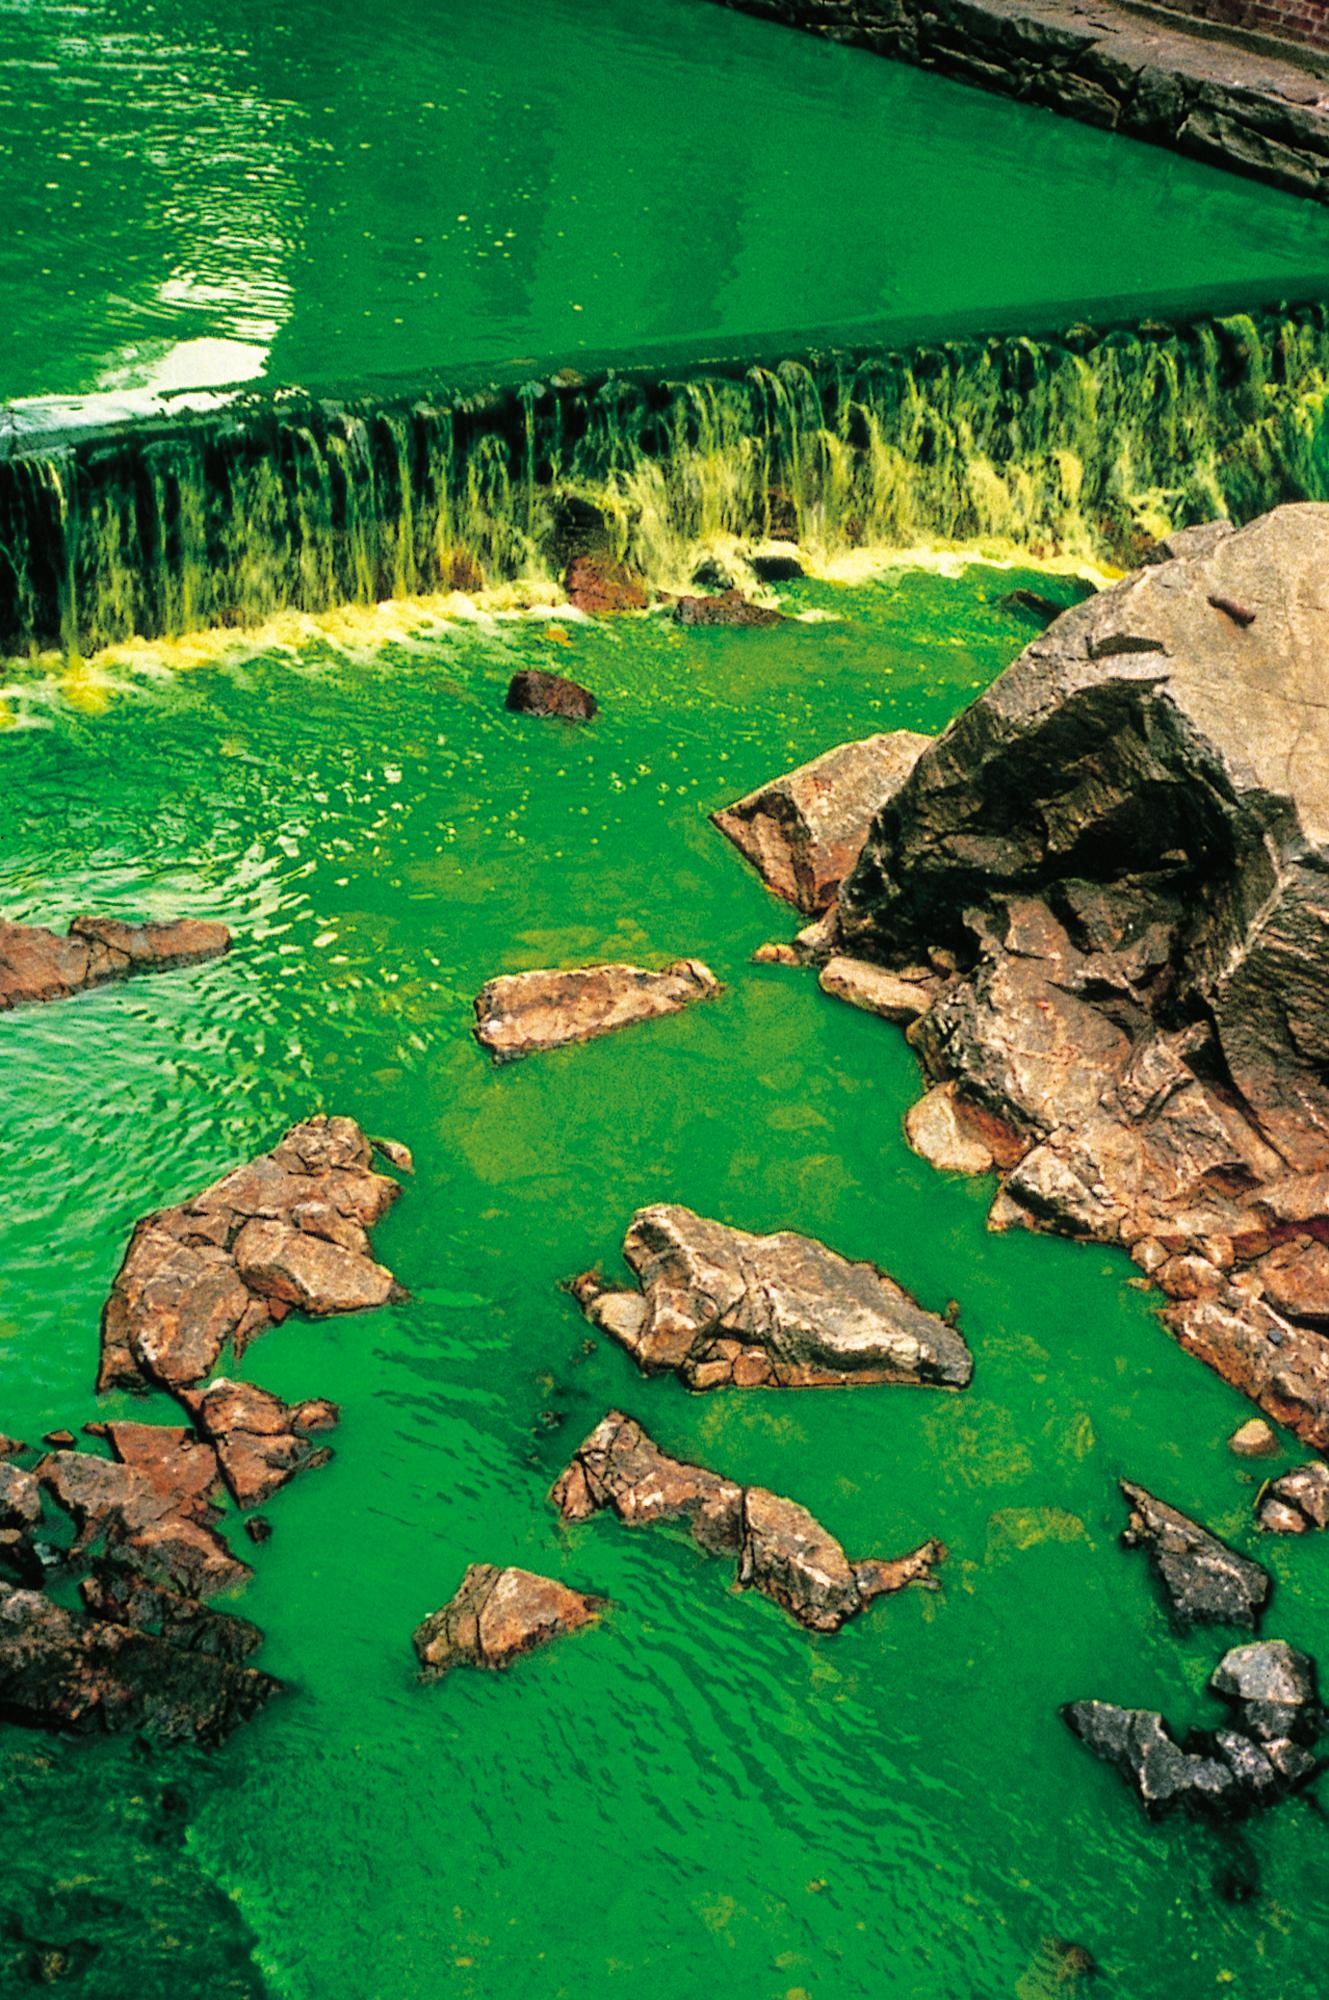 Green_river_100062